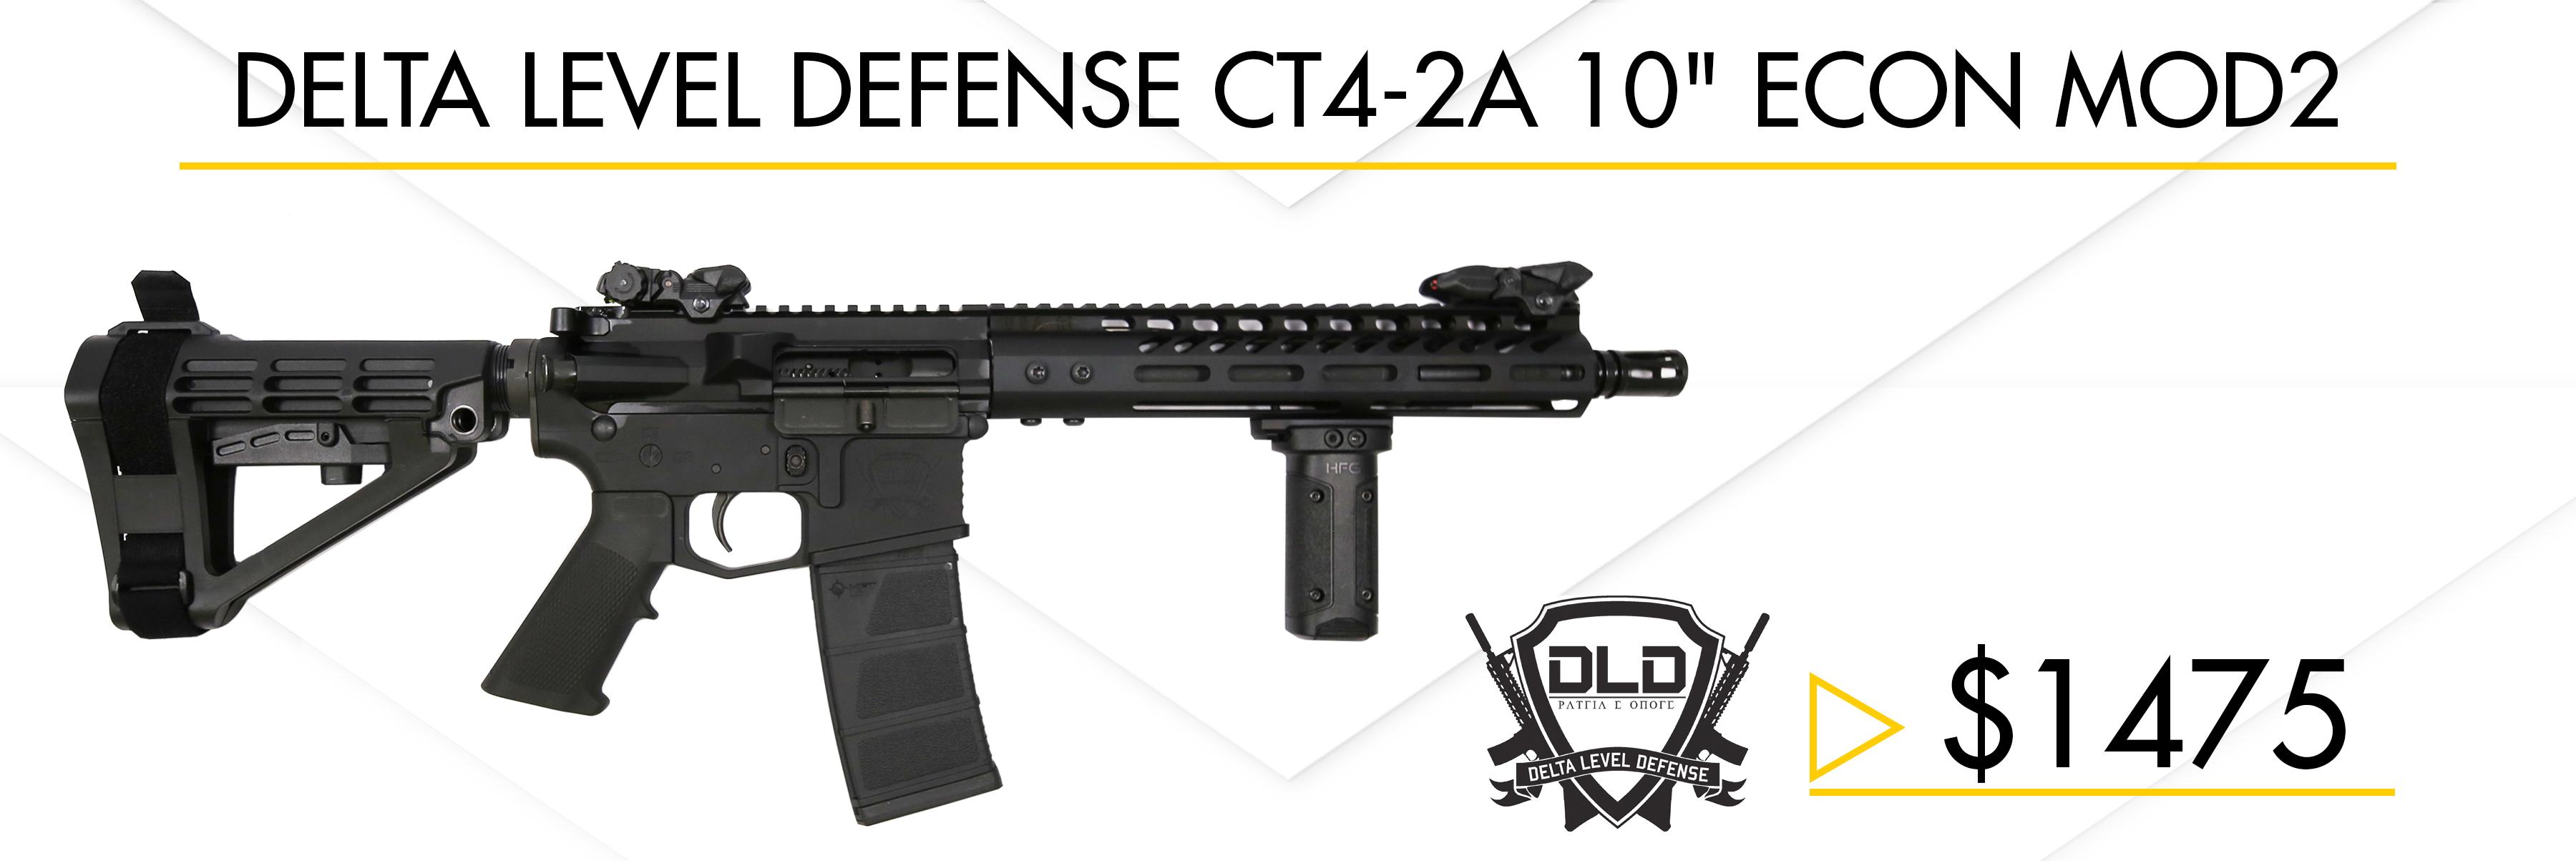 https://shop.rtsponline.com/products/delta-level-defense-101-36088-4646